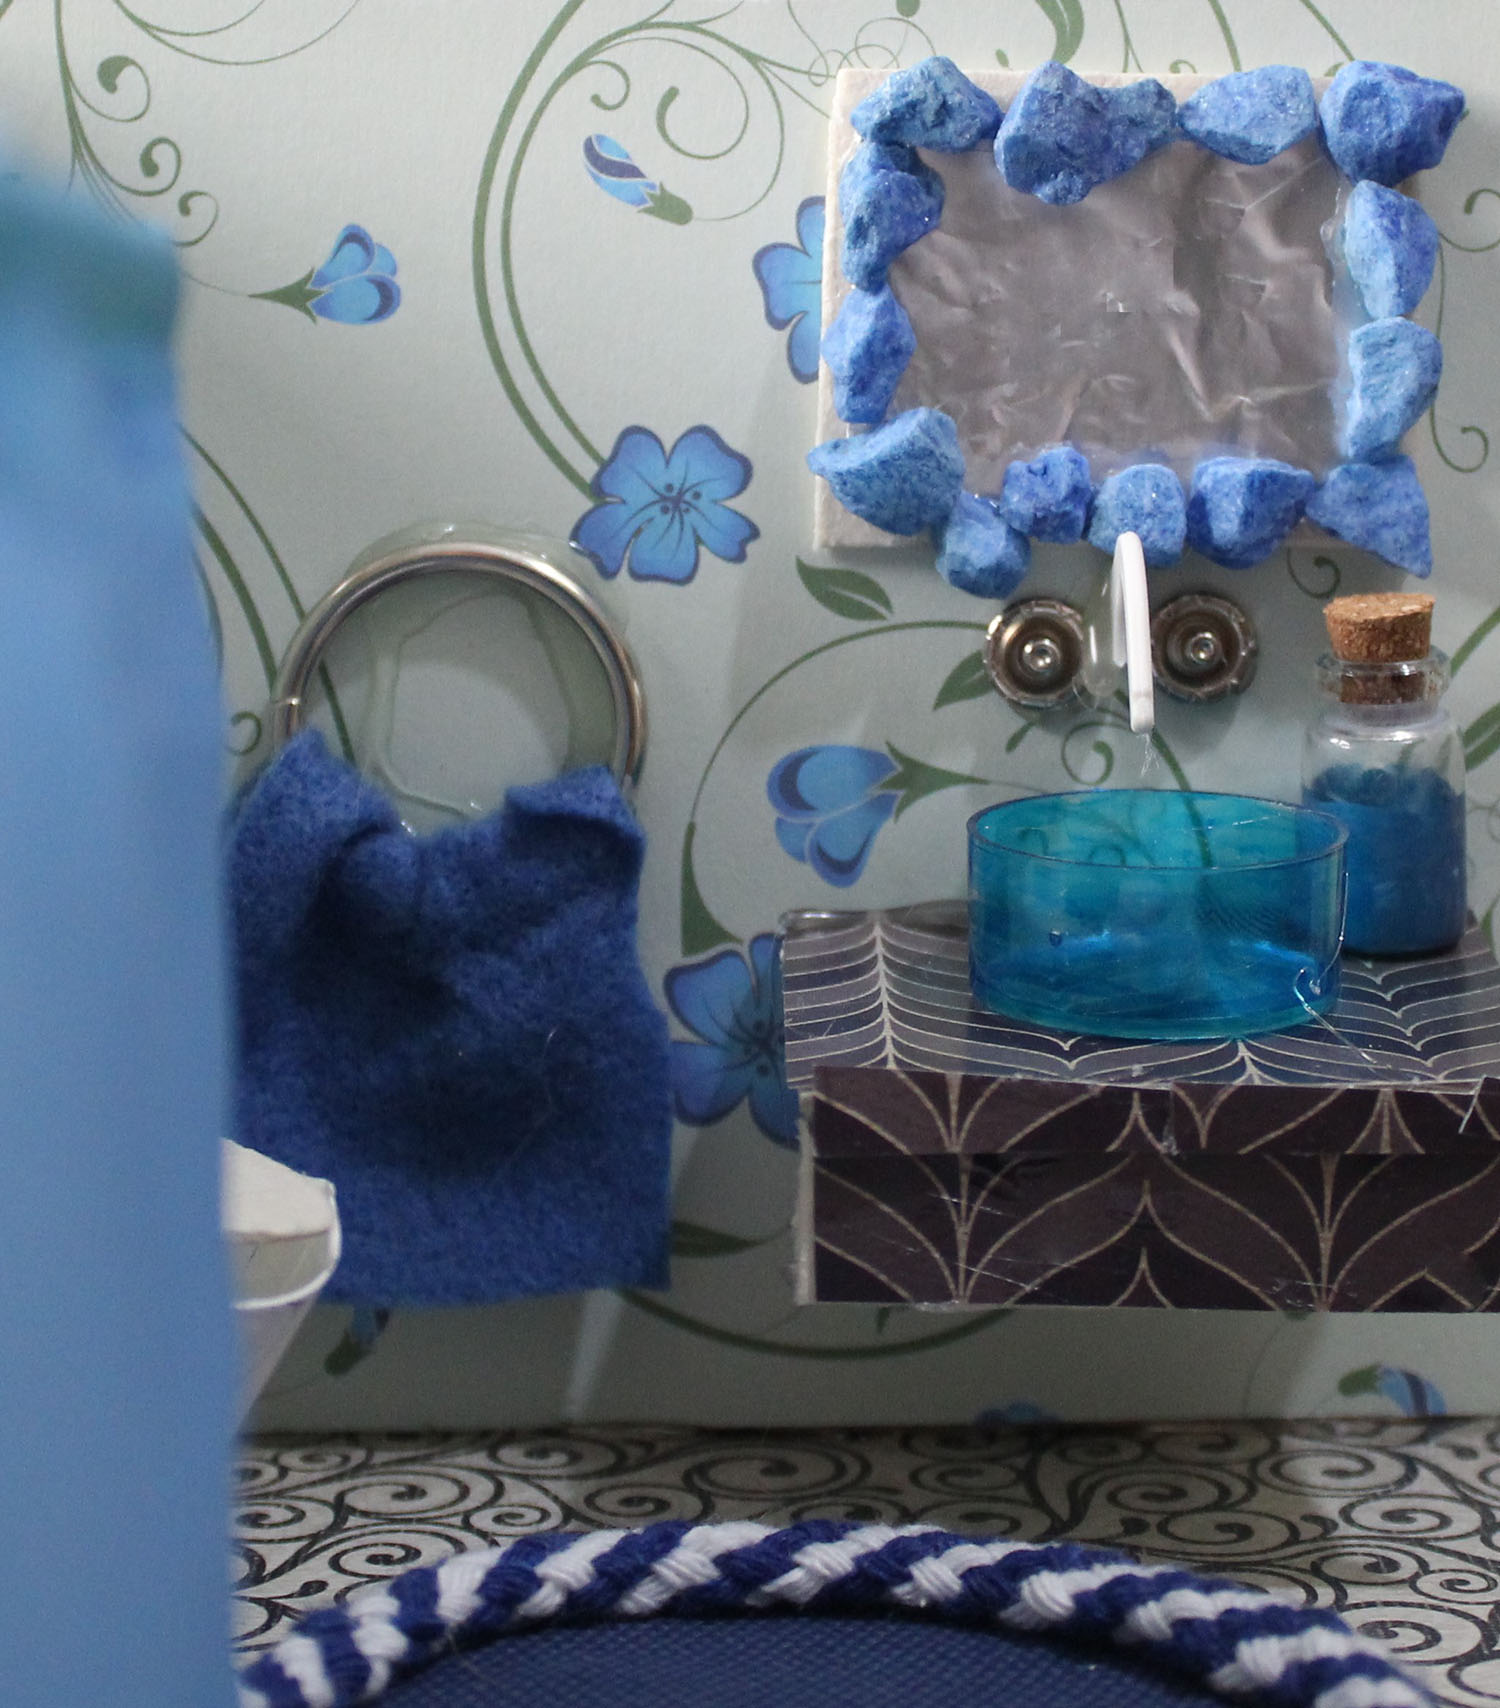 IMG 5254 - מיניאטורות: חדר רחצה